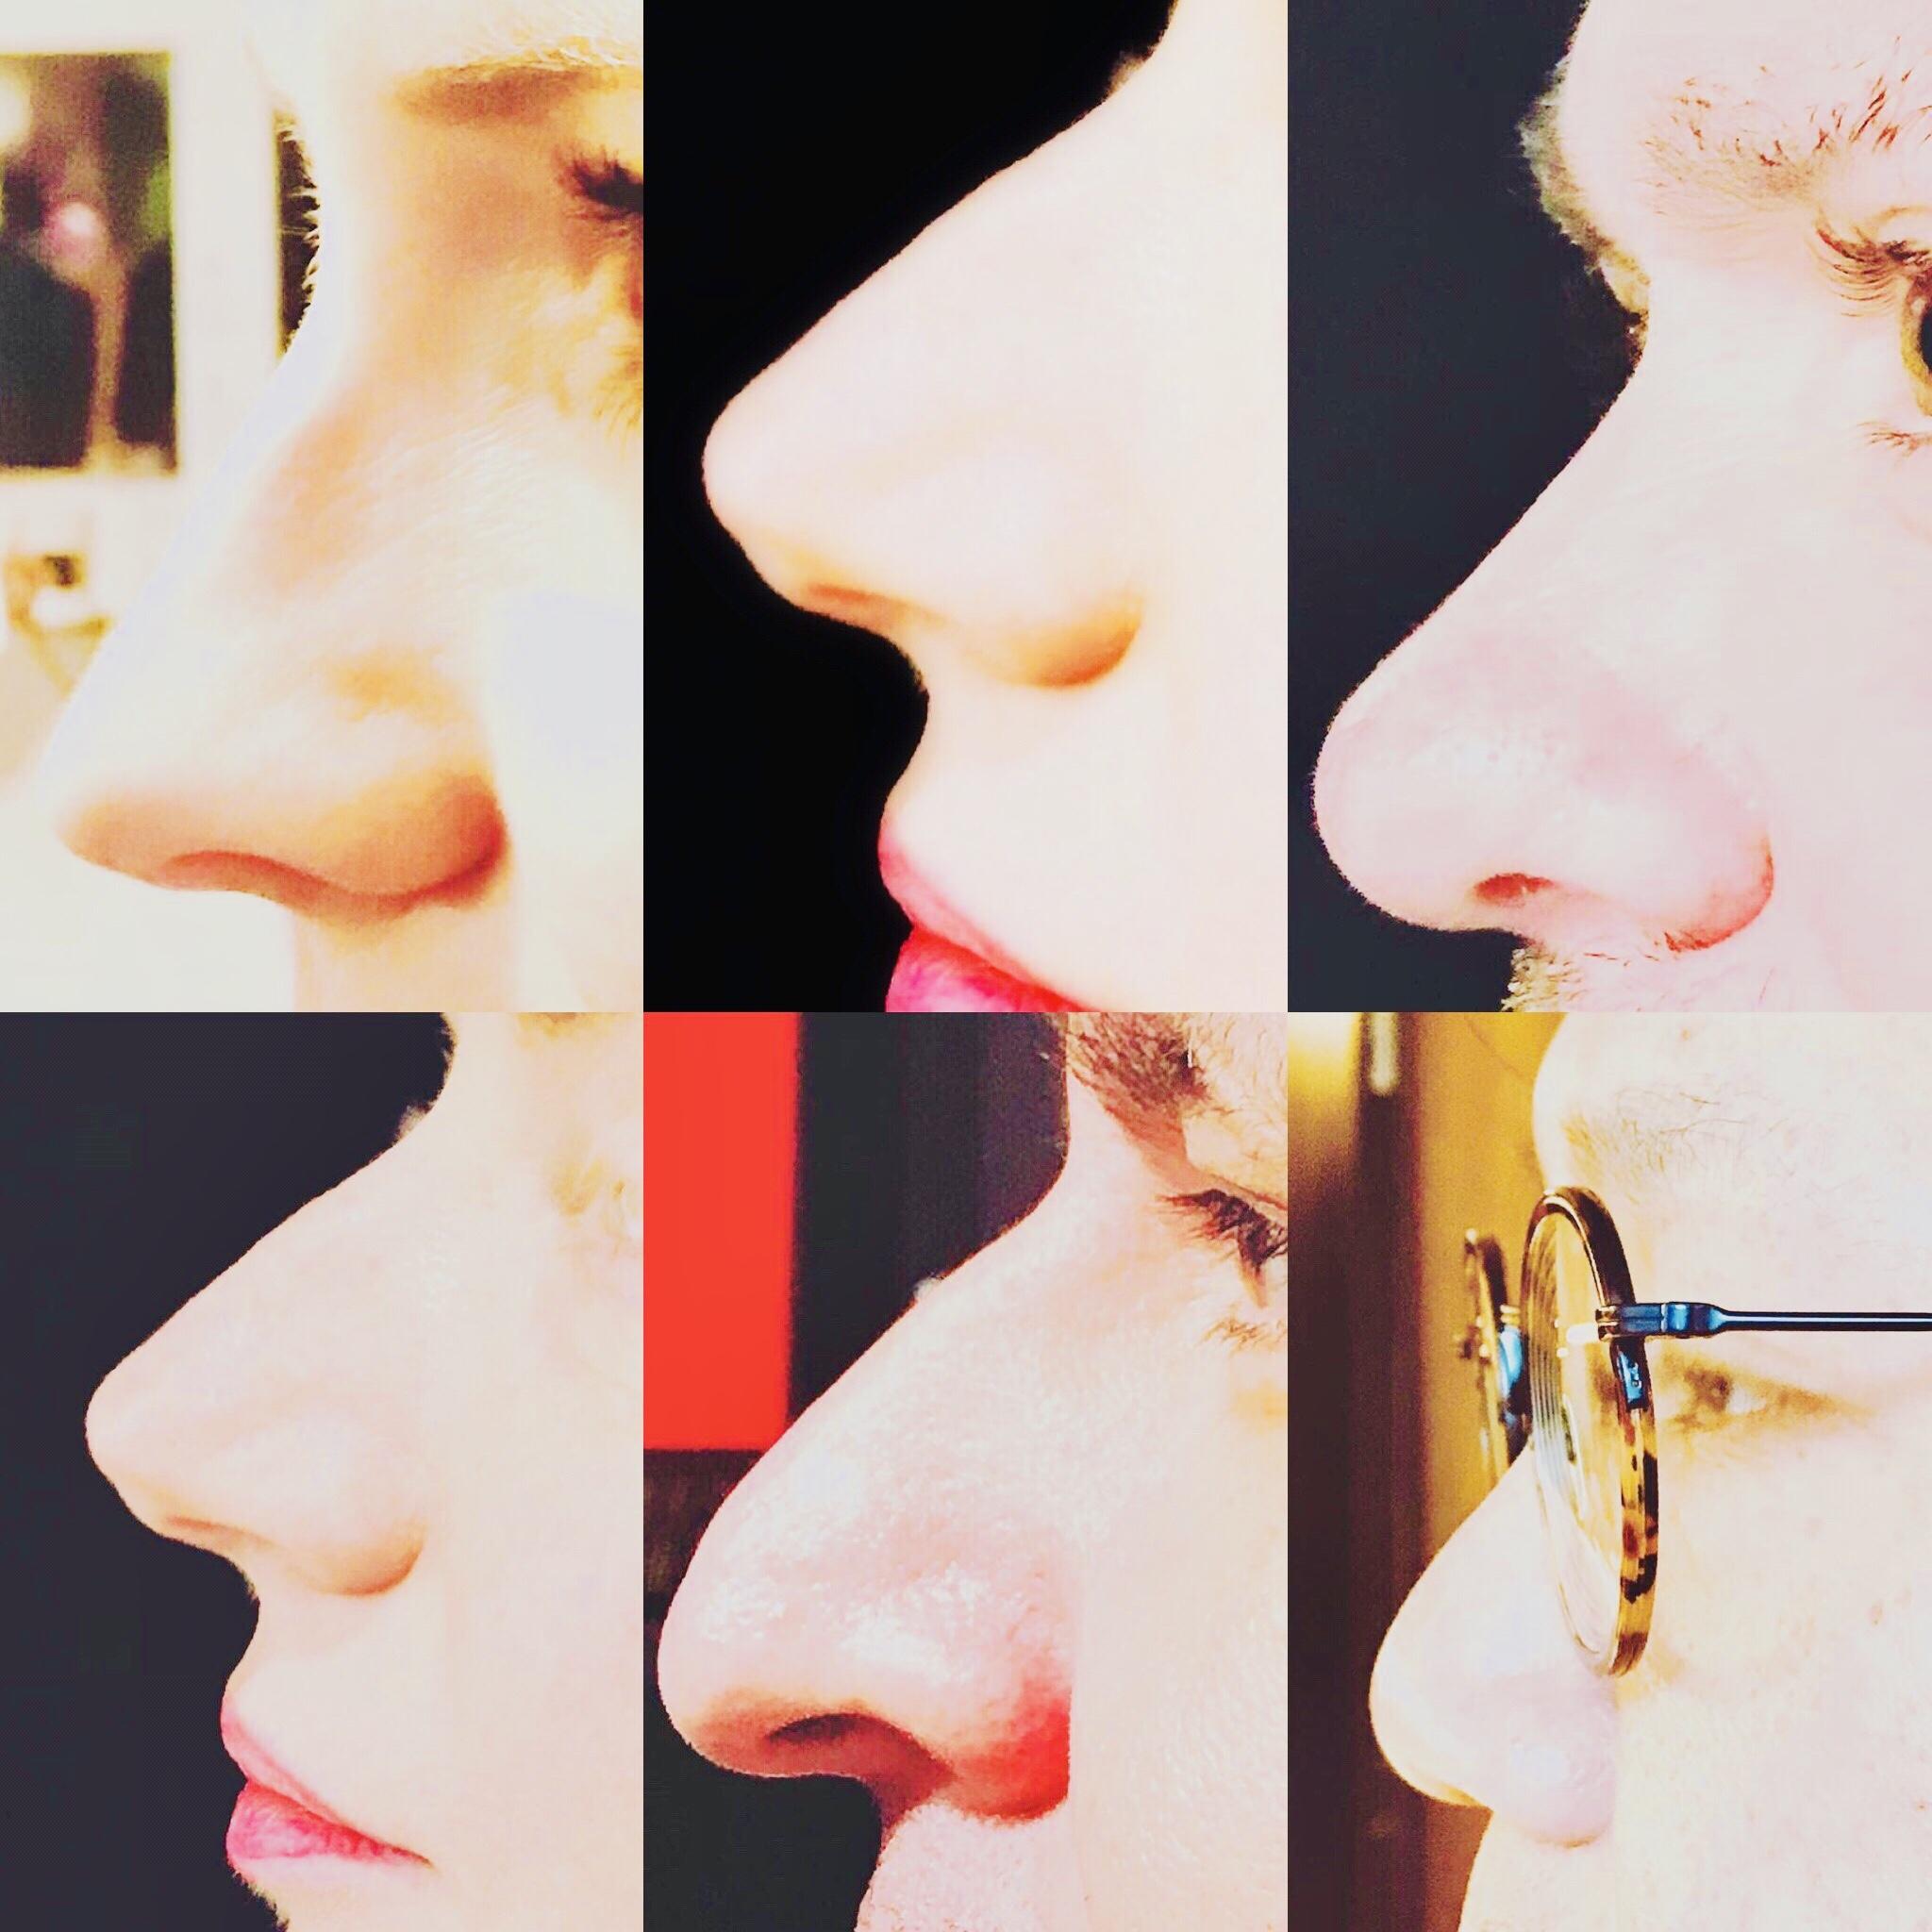 Noses Perfume